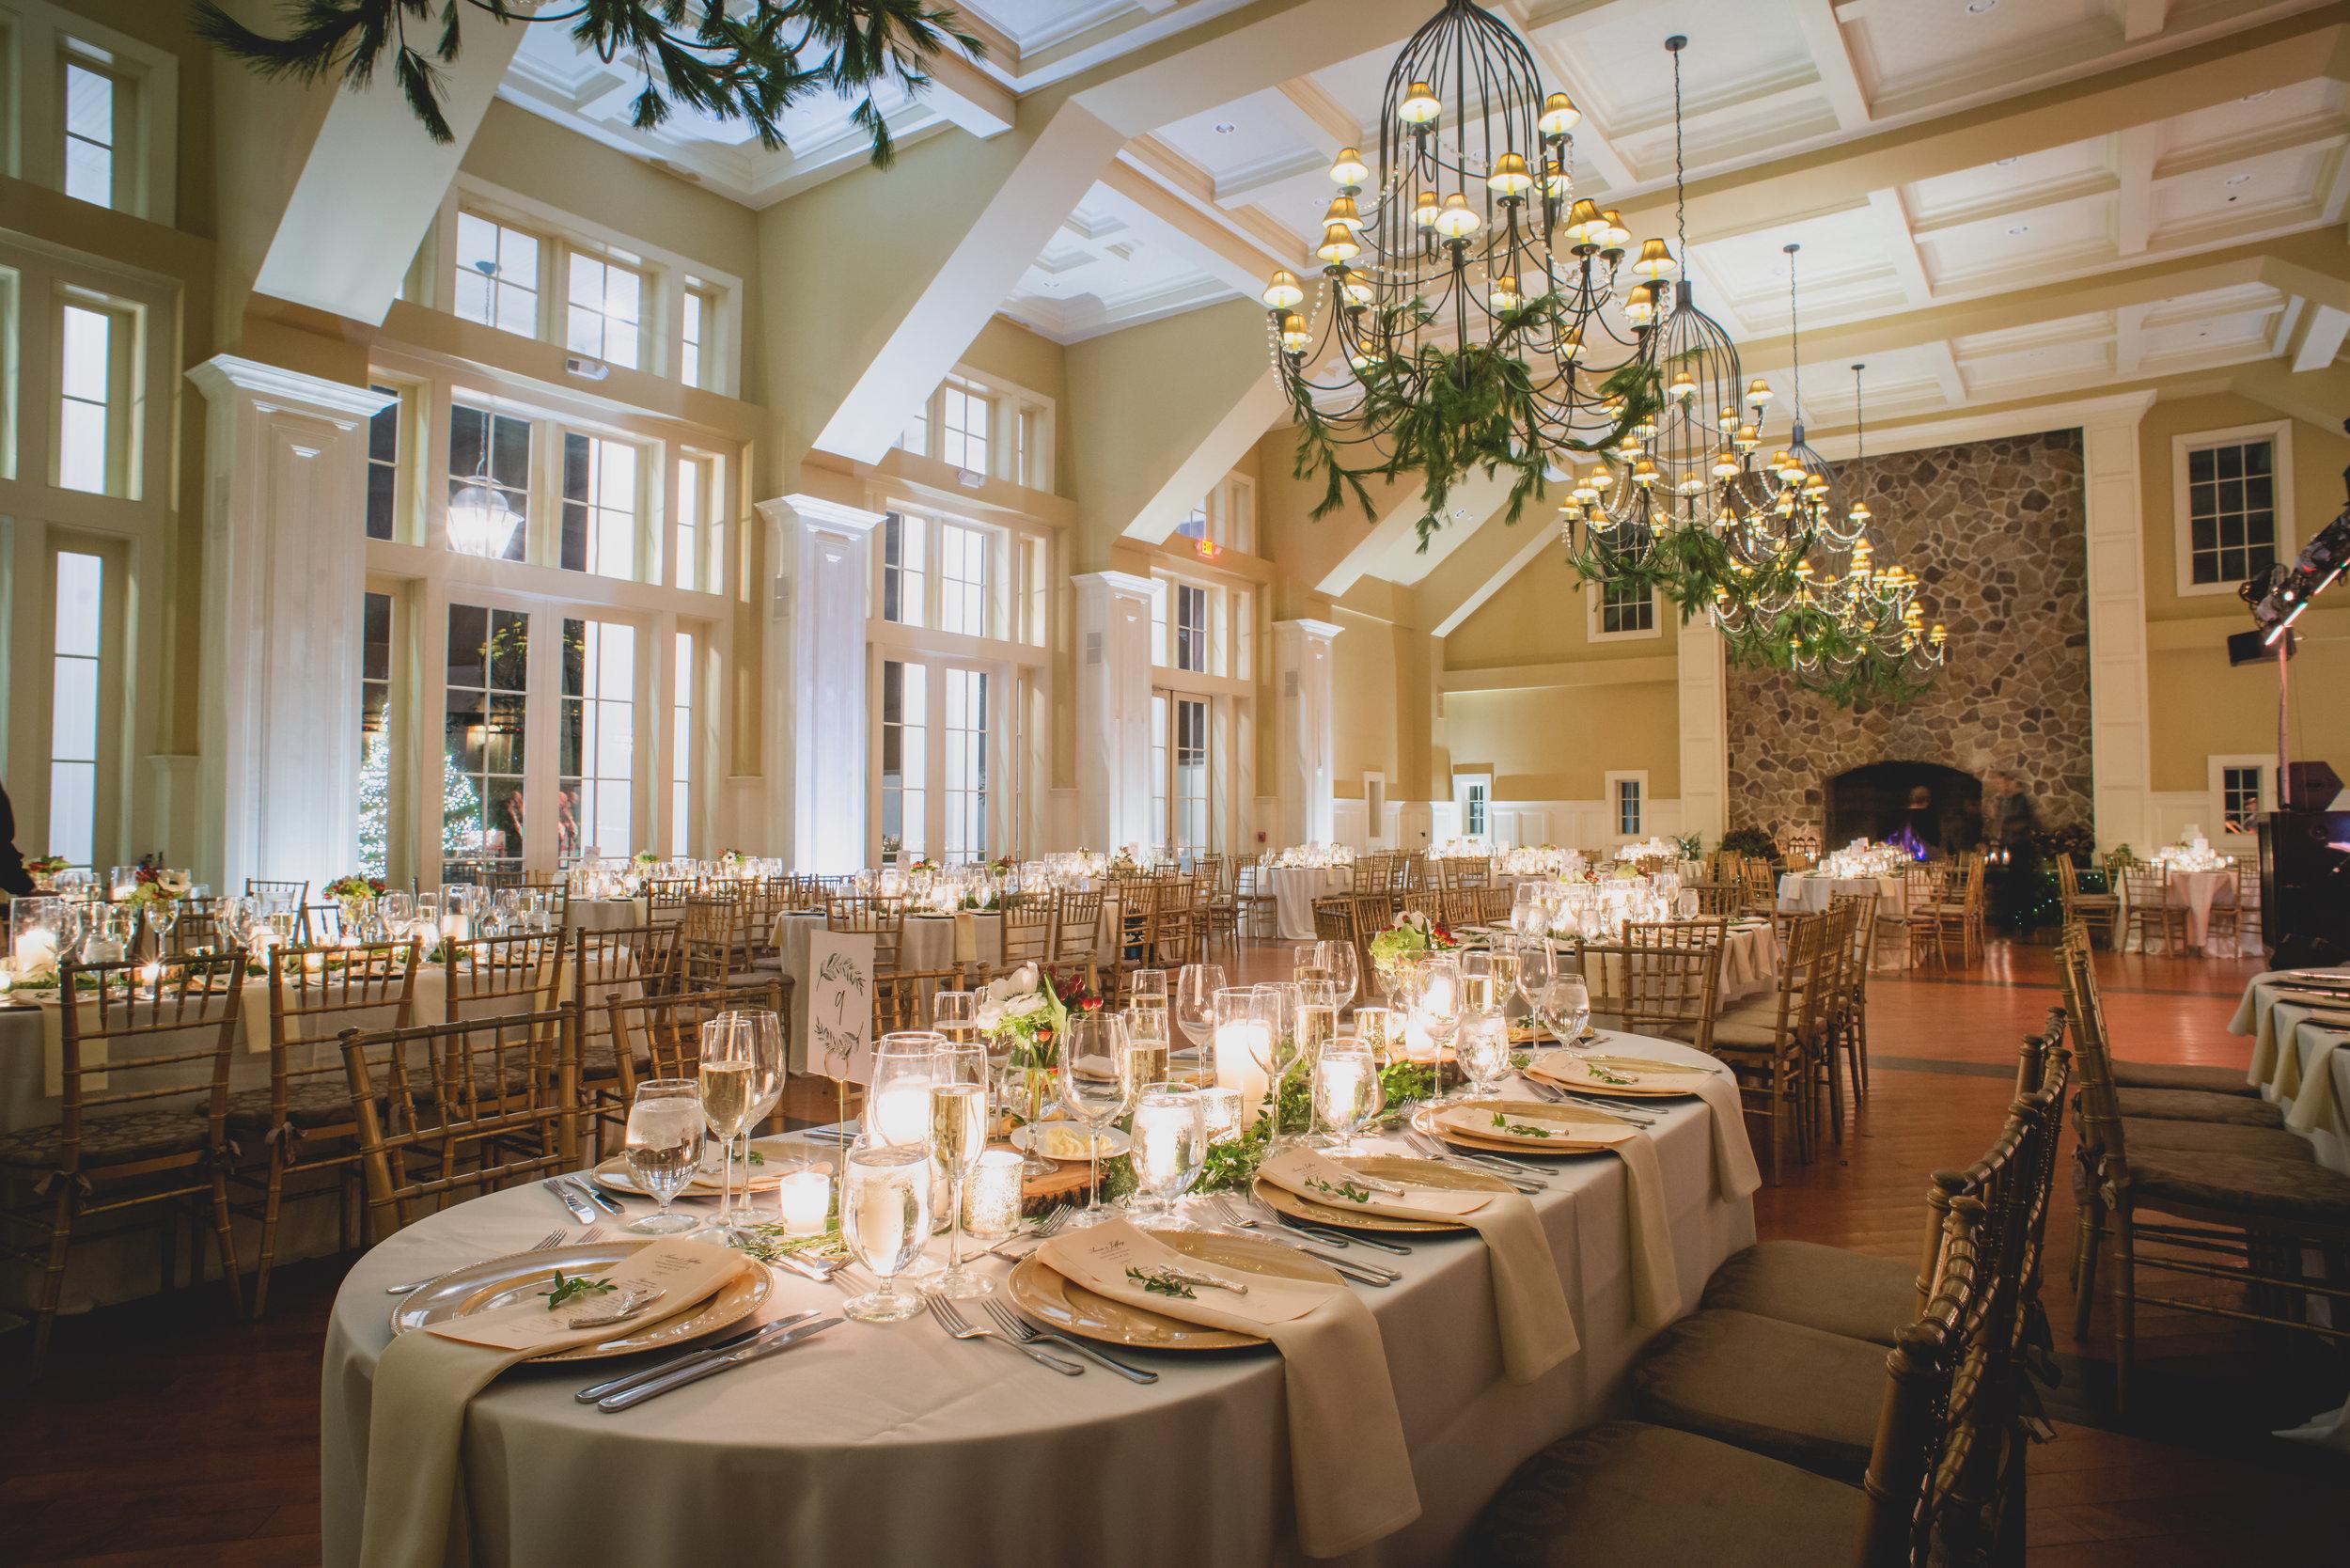 Whitehouse Station, NJ Wedding Venue - The Ryland Inn - Wedding Reception Photography